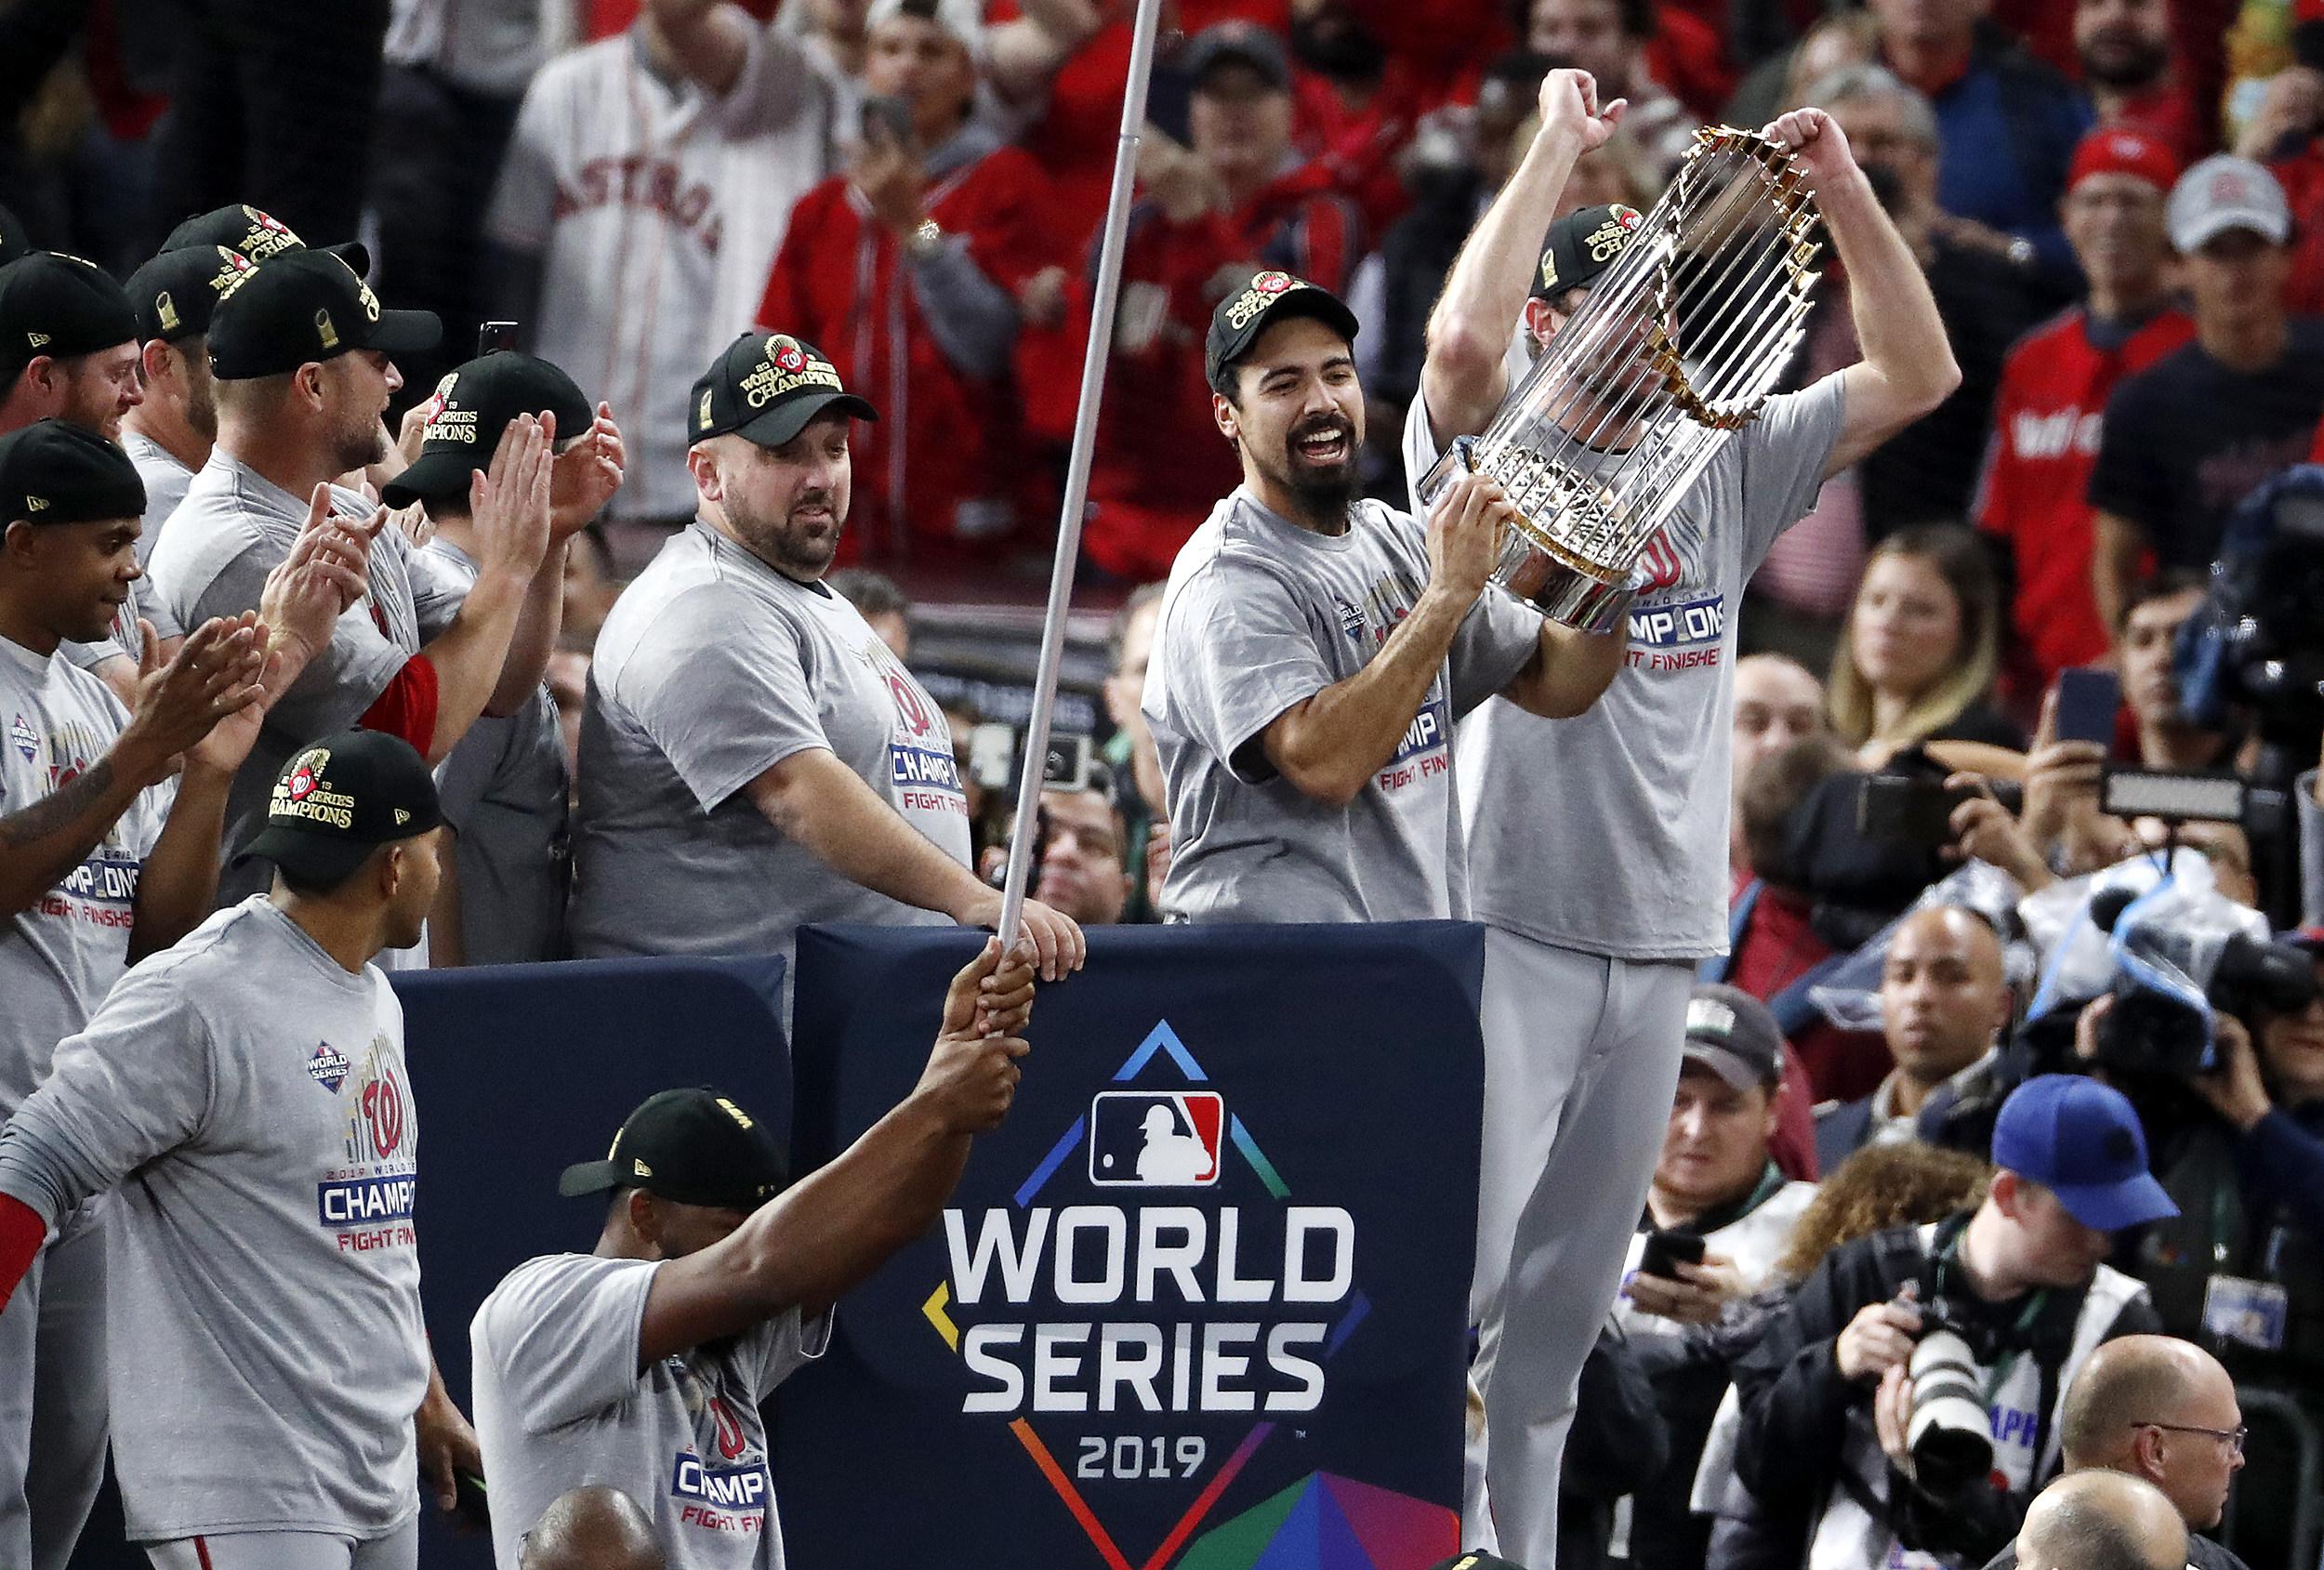 Washington Rallies to Win World Series